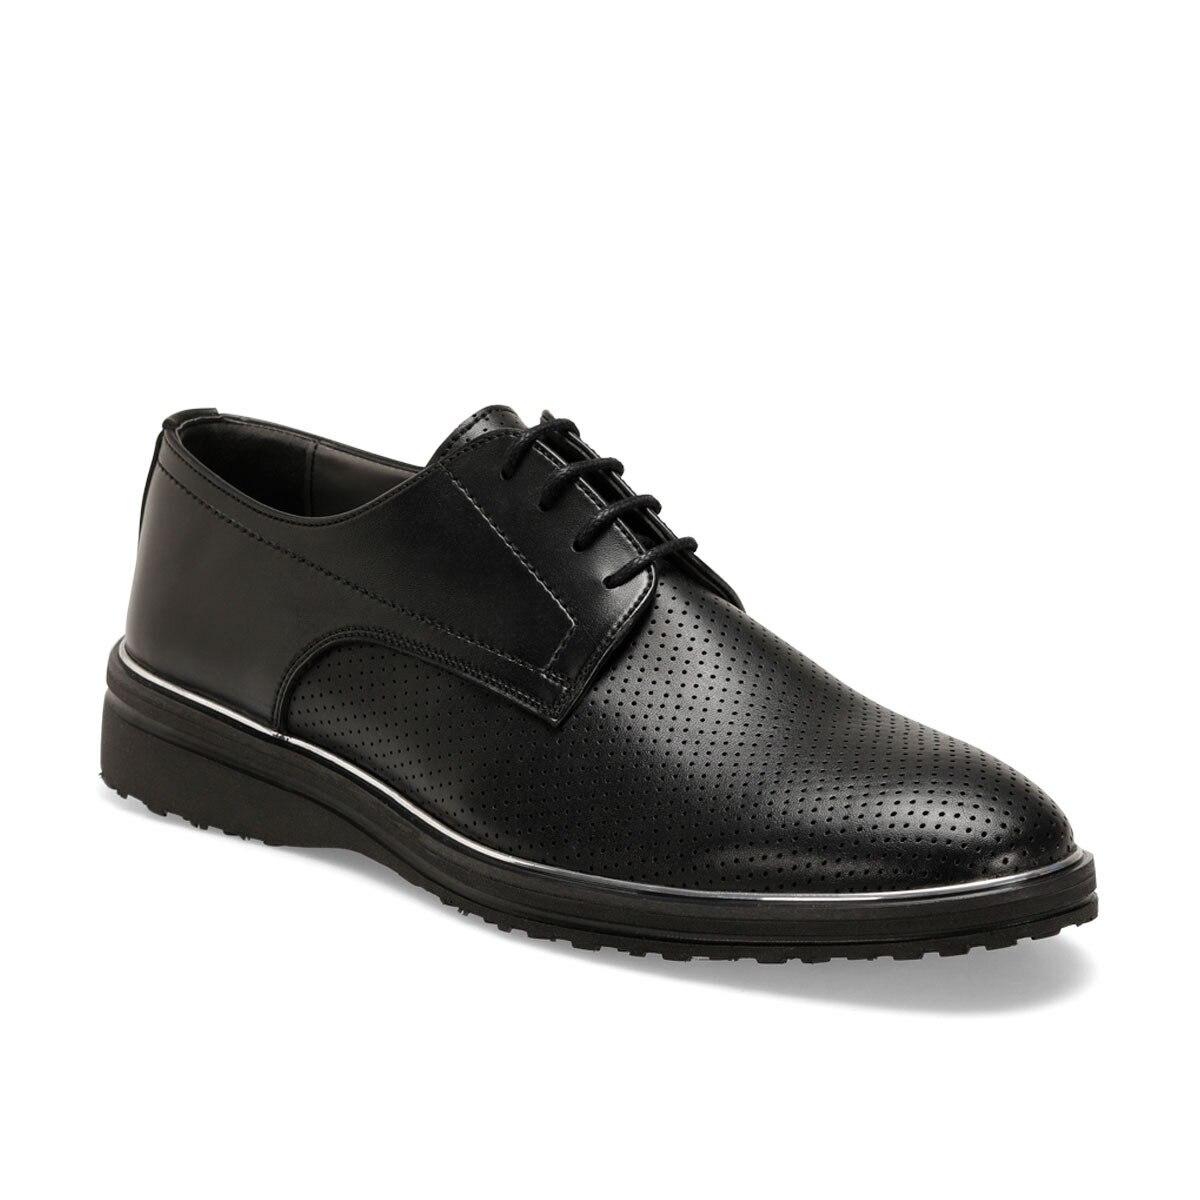 Flo 313-1 黒人男性靴 JJ-Stiller